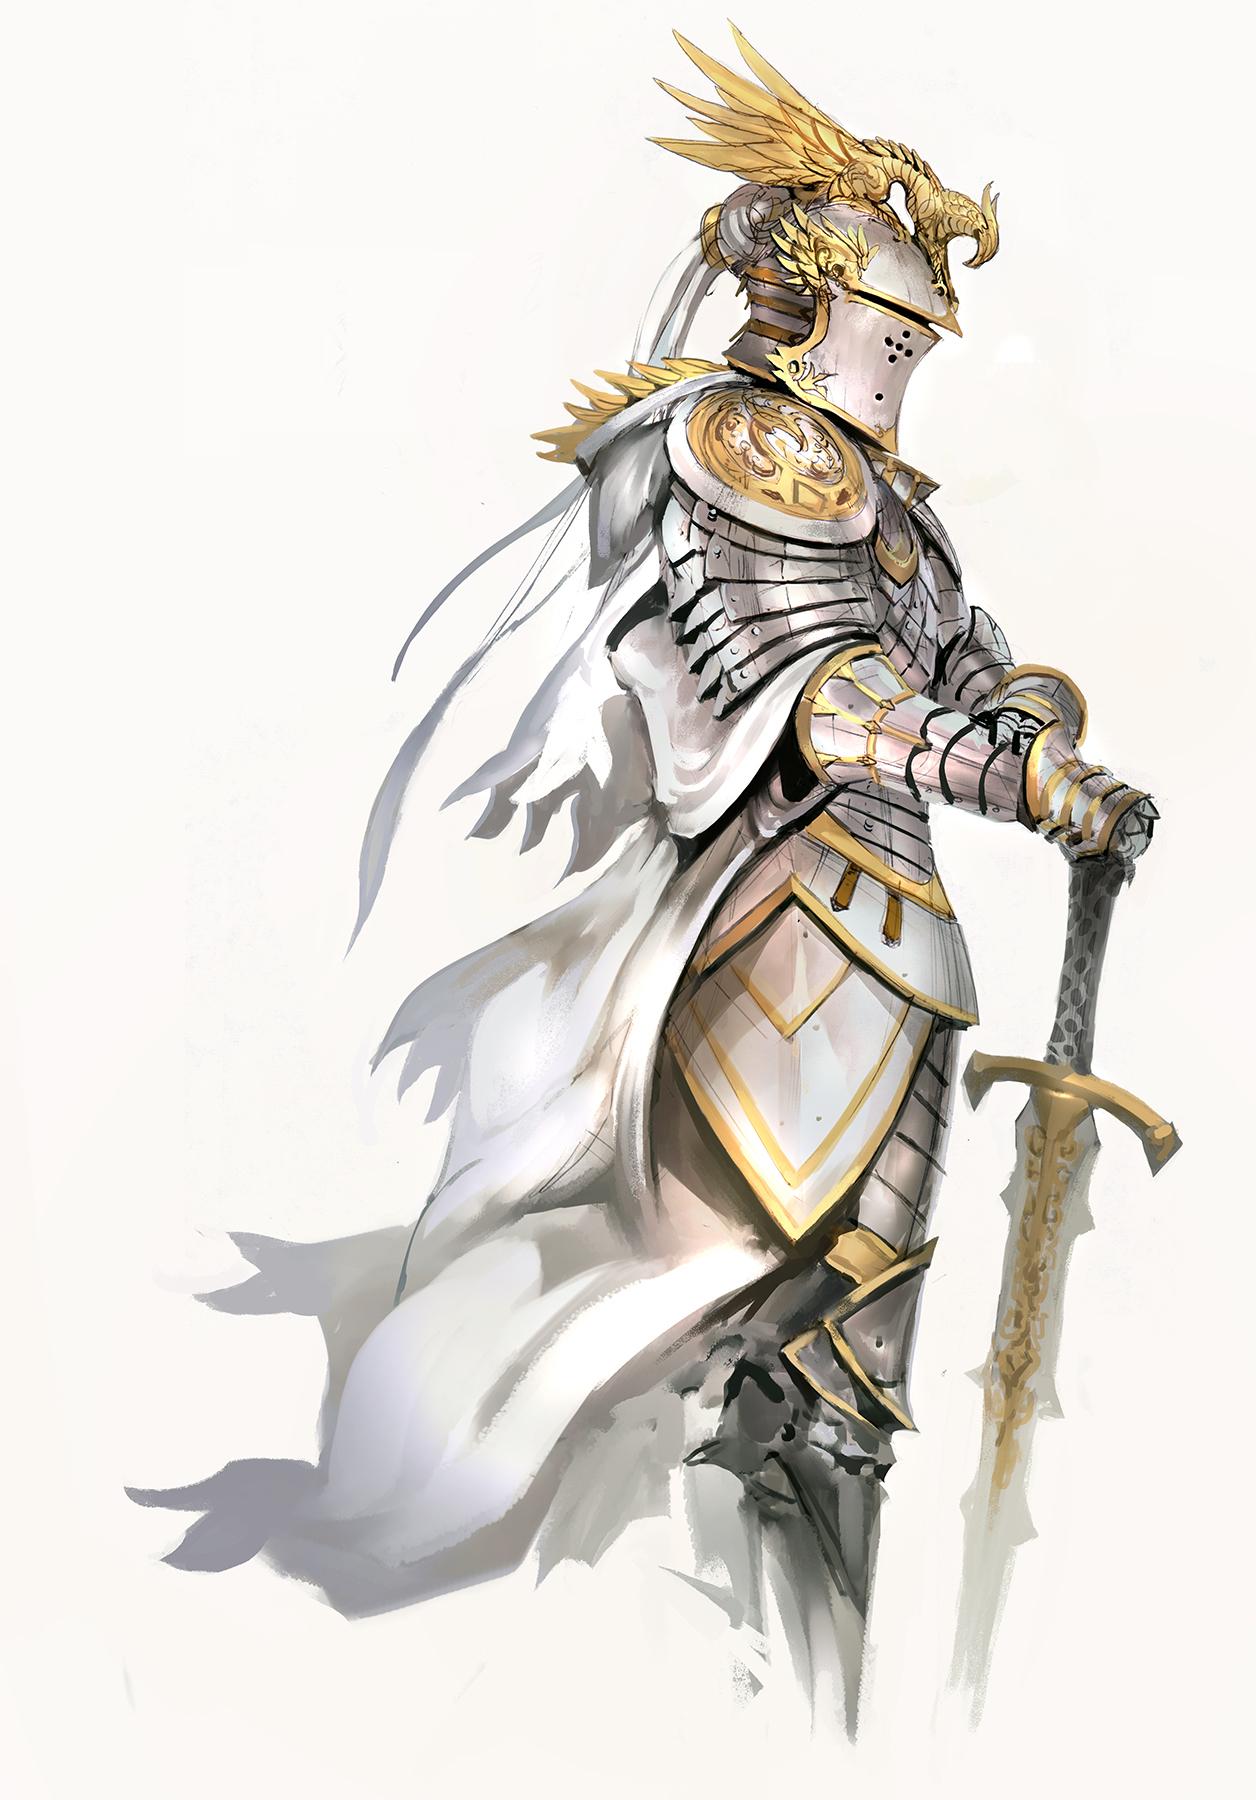 Kekaik white knight 1 a020fe05 a46s